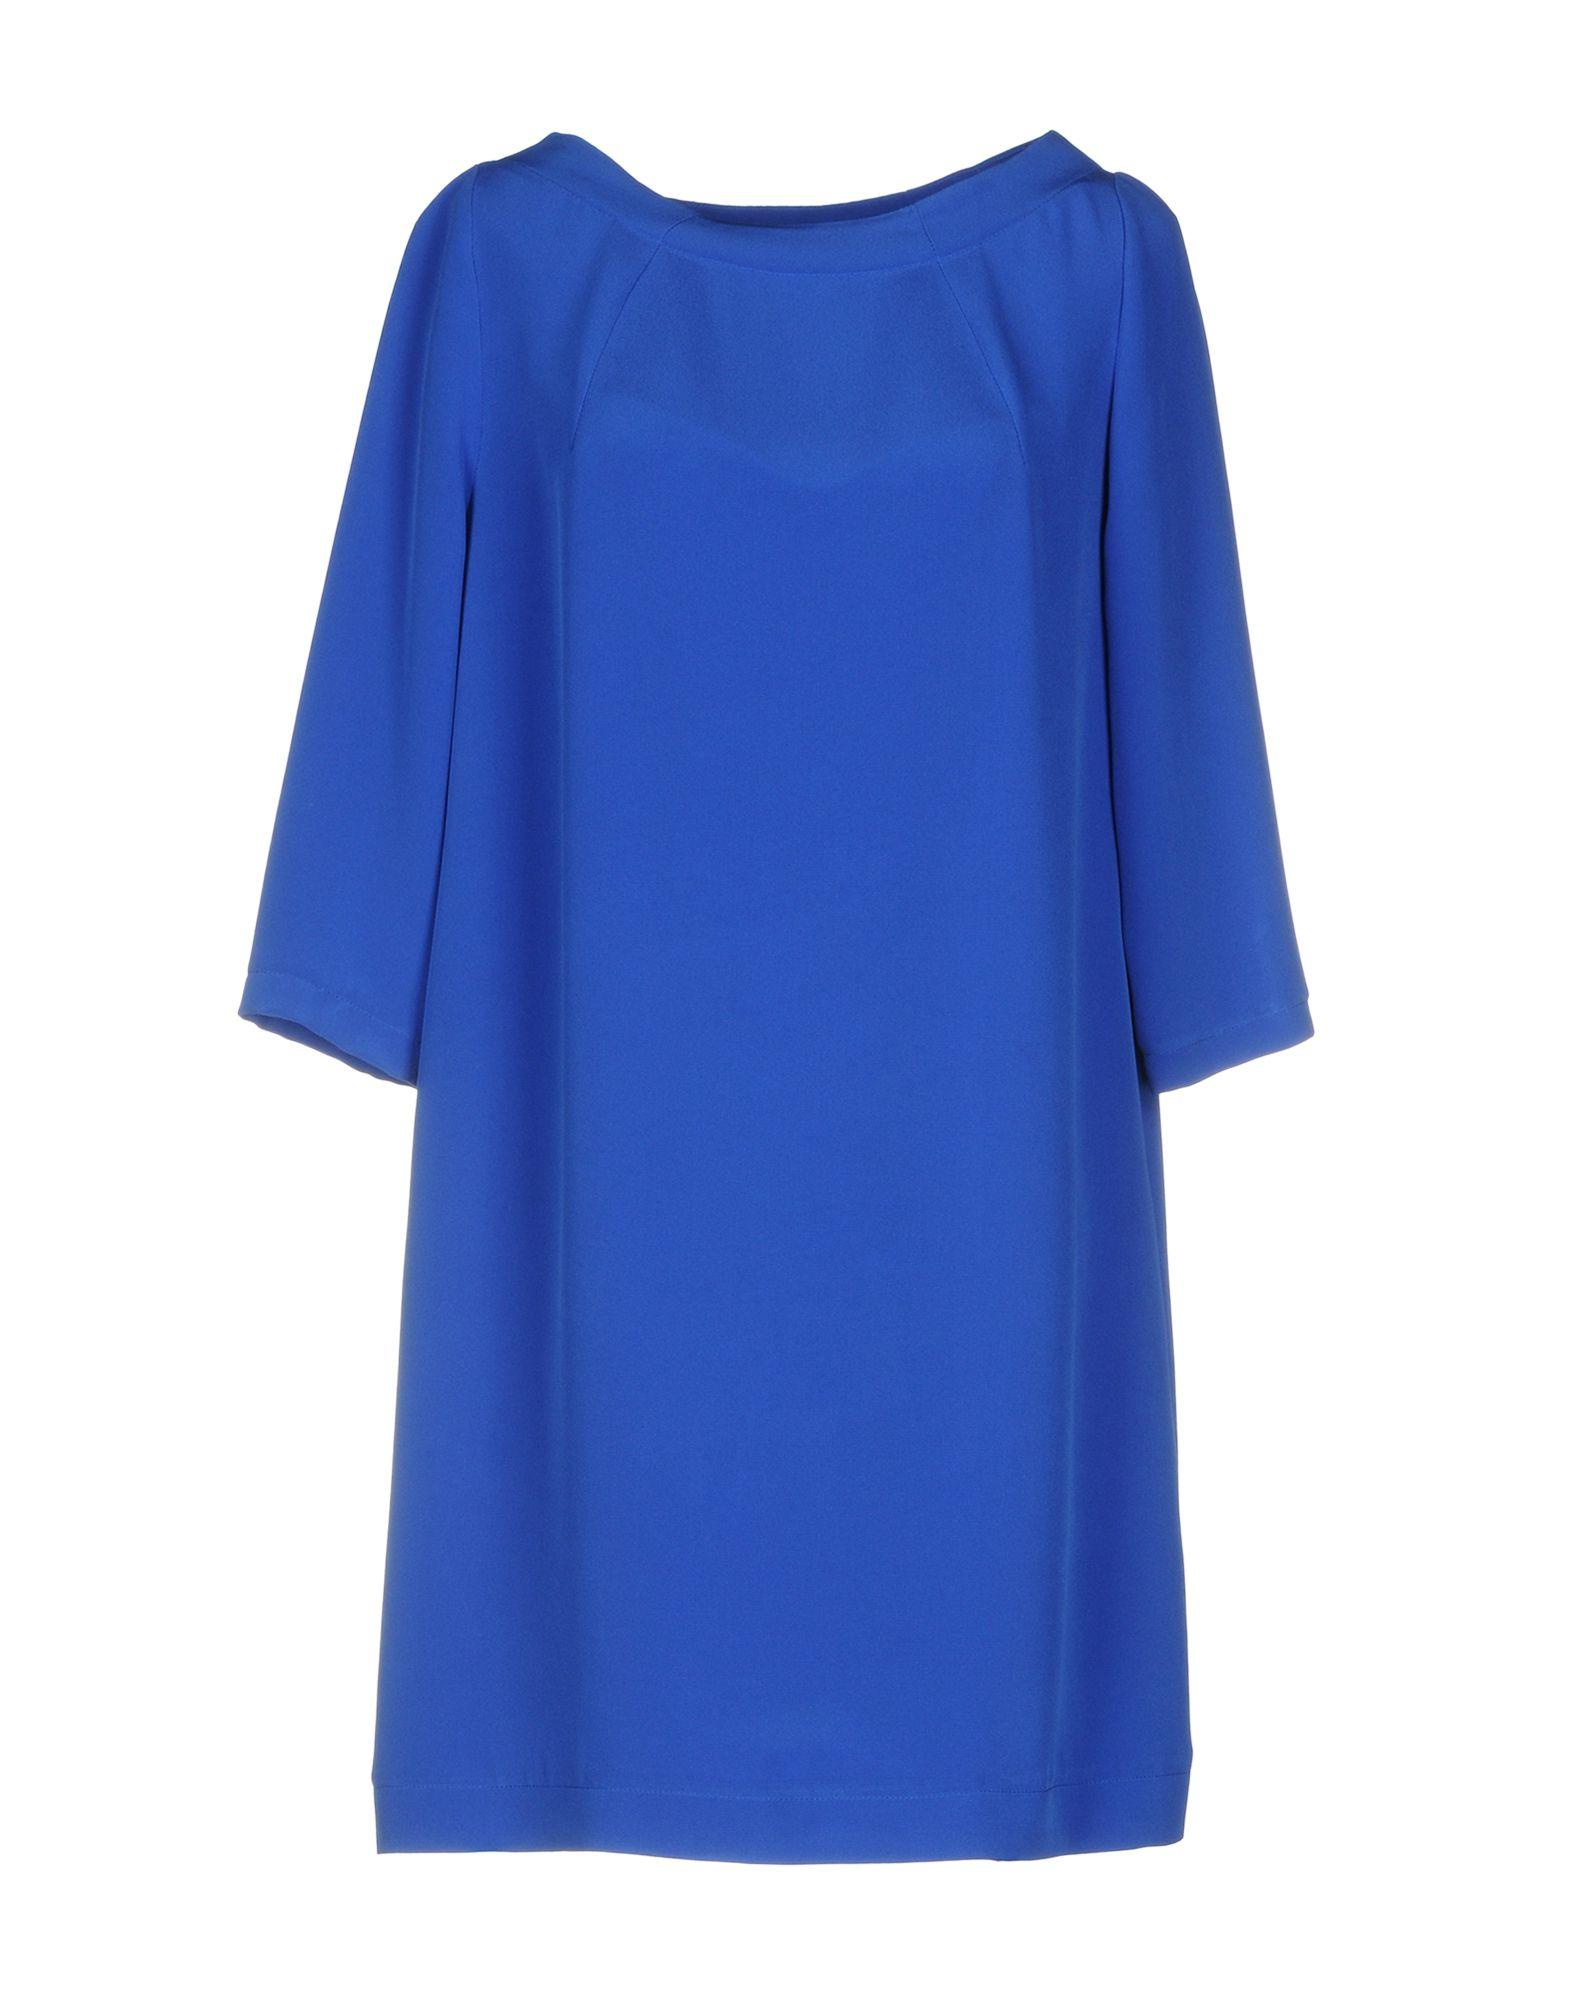 GIANLUCA CAPANNOLO | GIANLUCA CAPANNOLO Short dresses 34715223 | Goxip